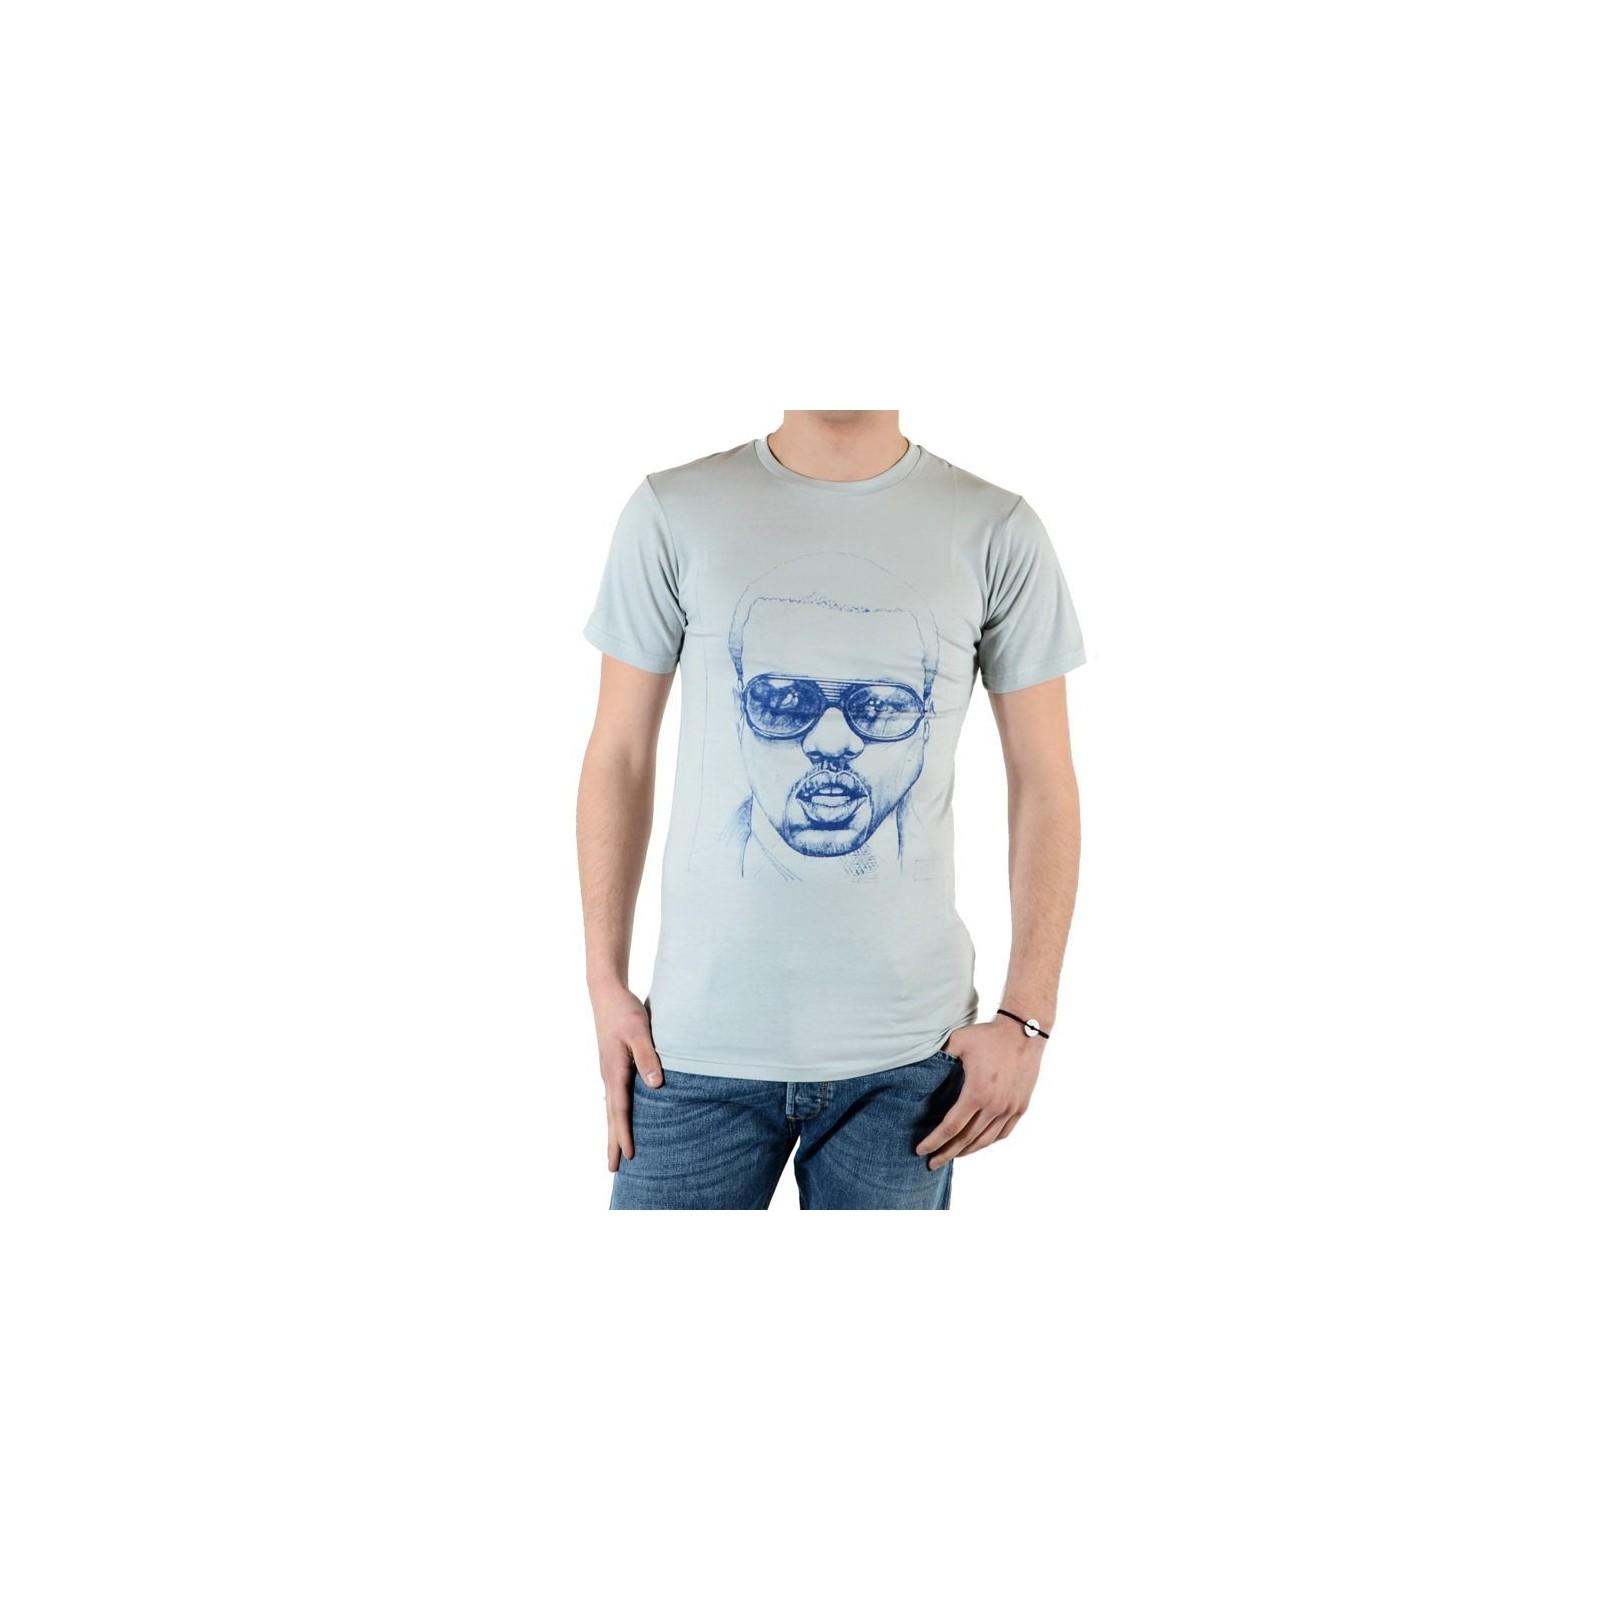 Tee Shirt Eleven Paris Kane Kanye West Gris Silver Grey